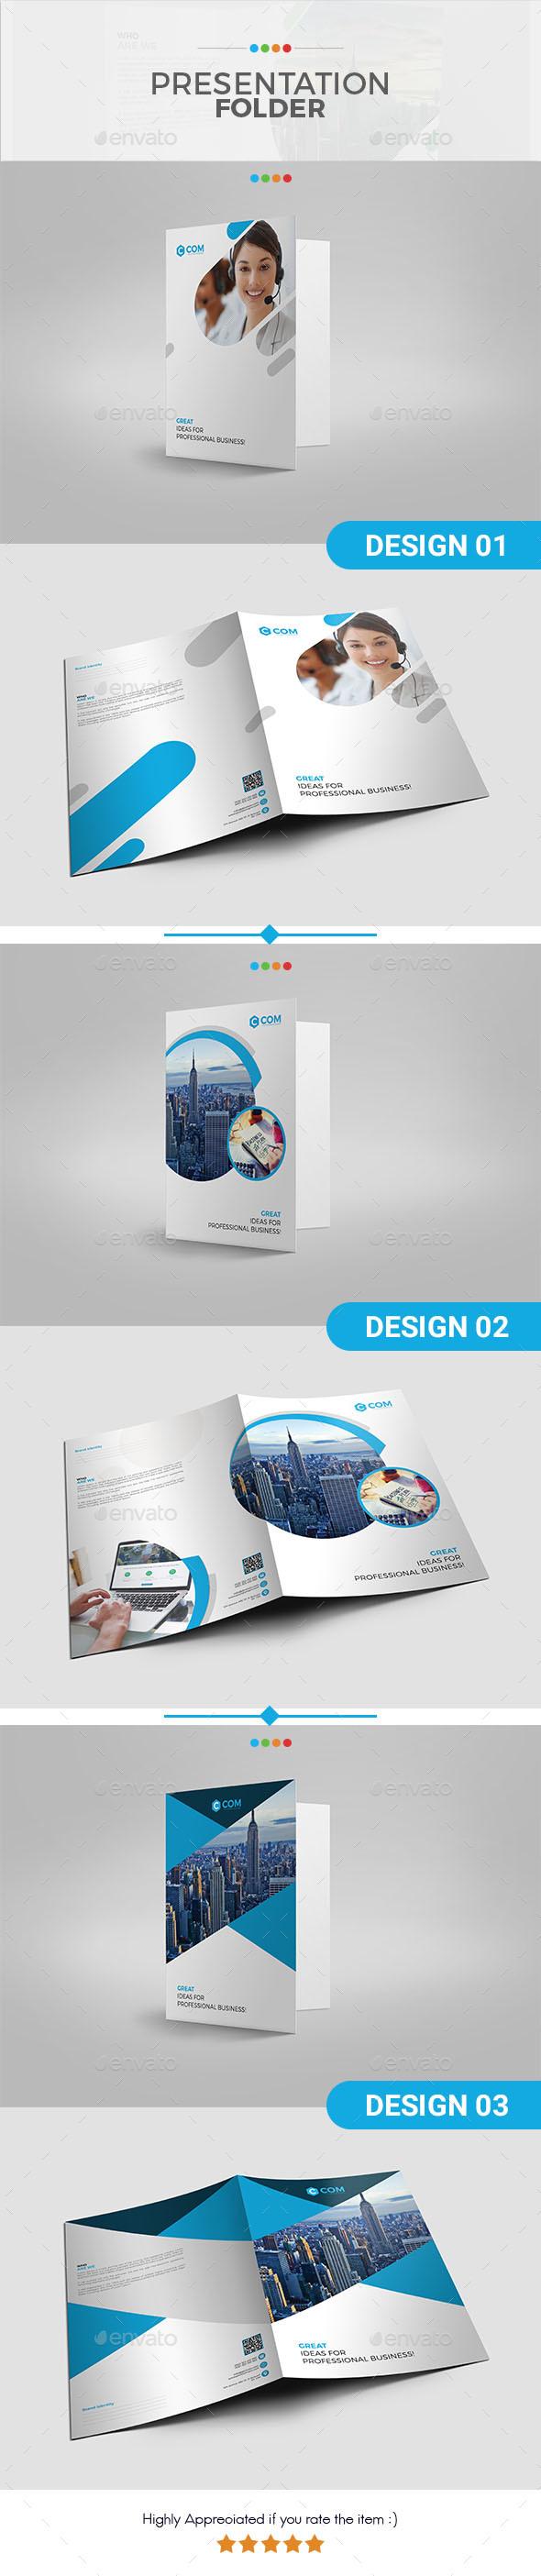 Presentation Folder Bundle Set 01 - Stationery Print Templates